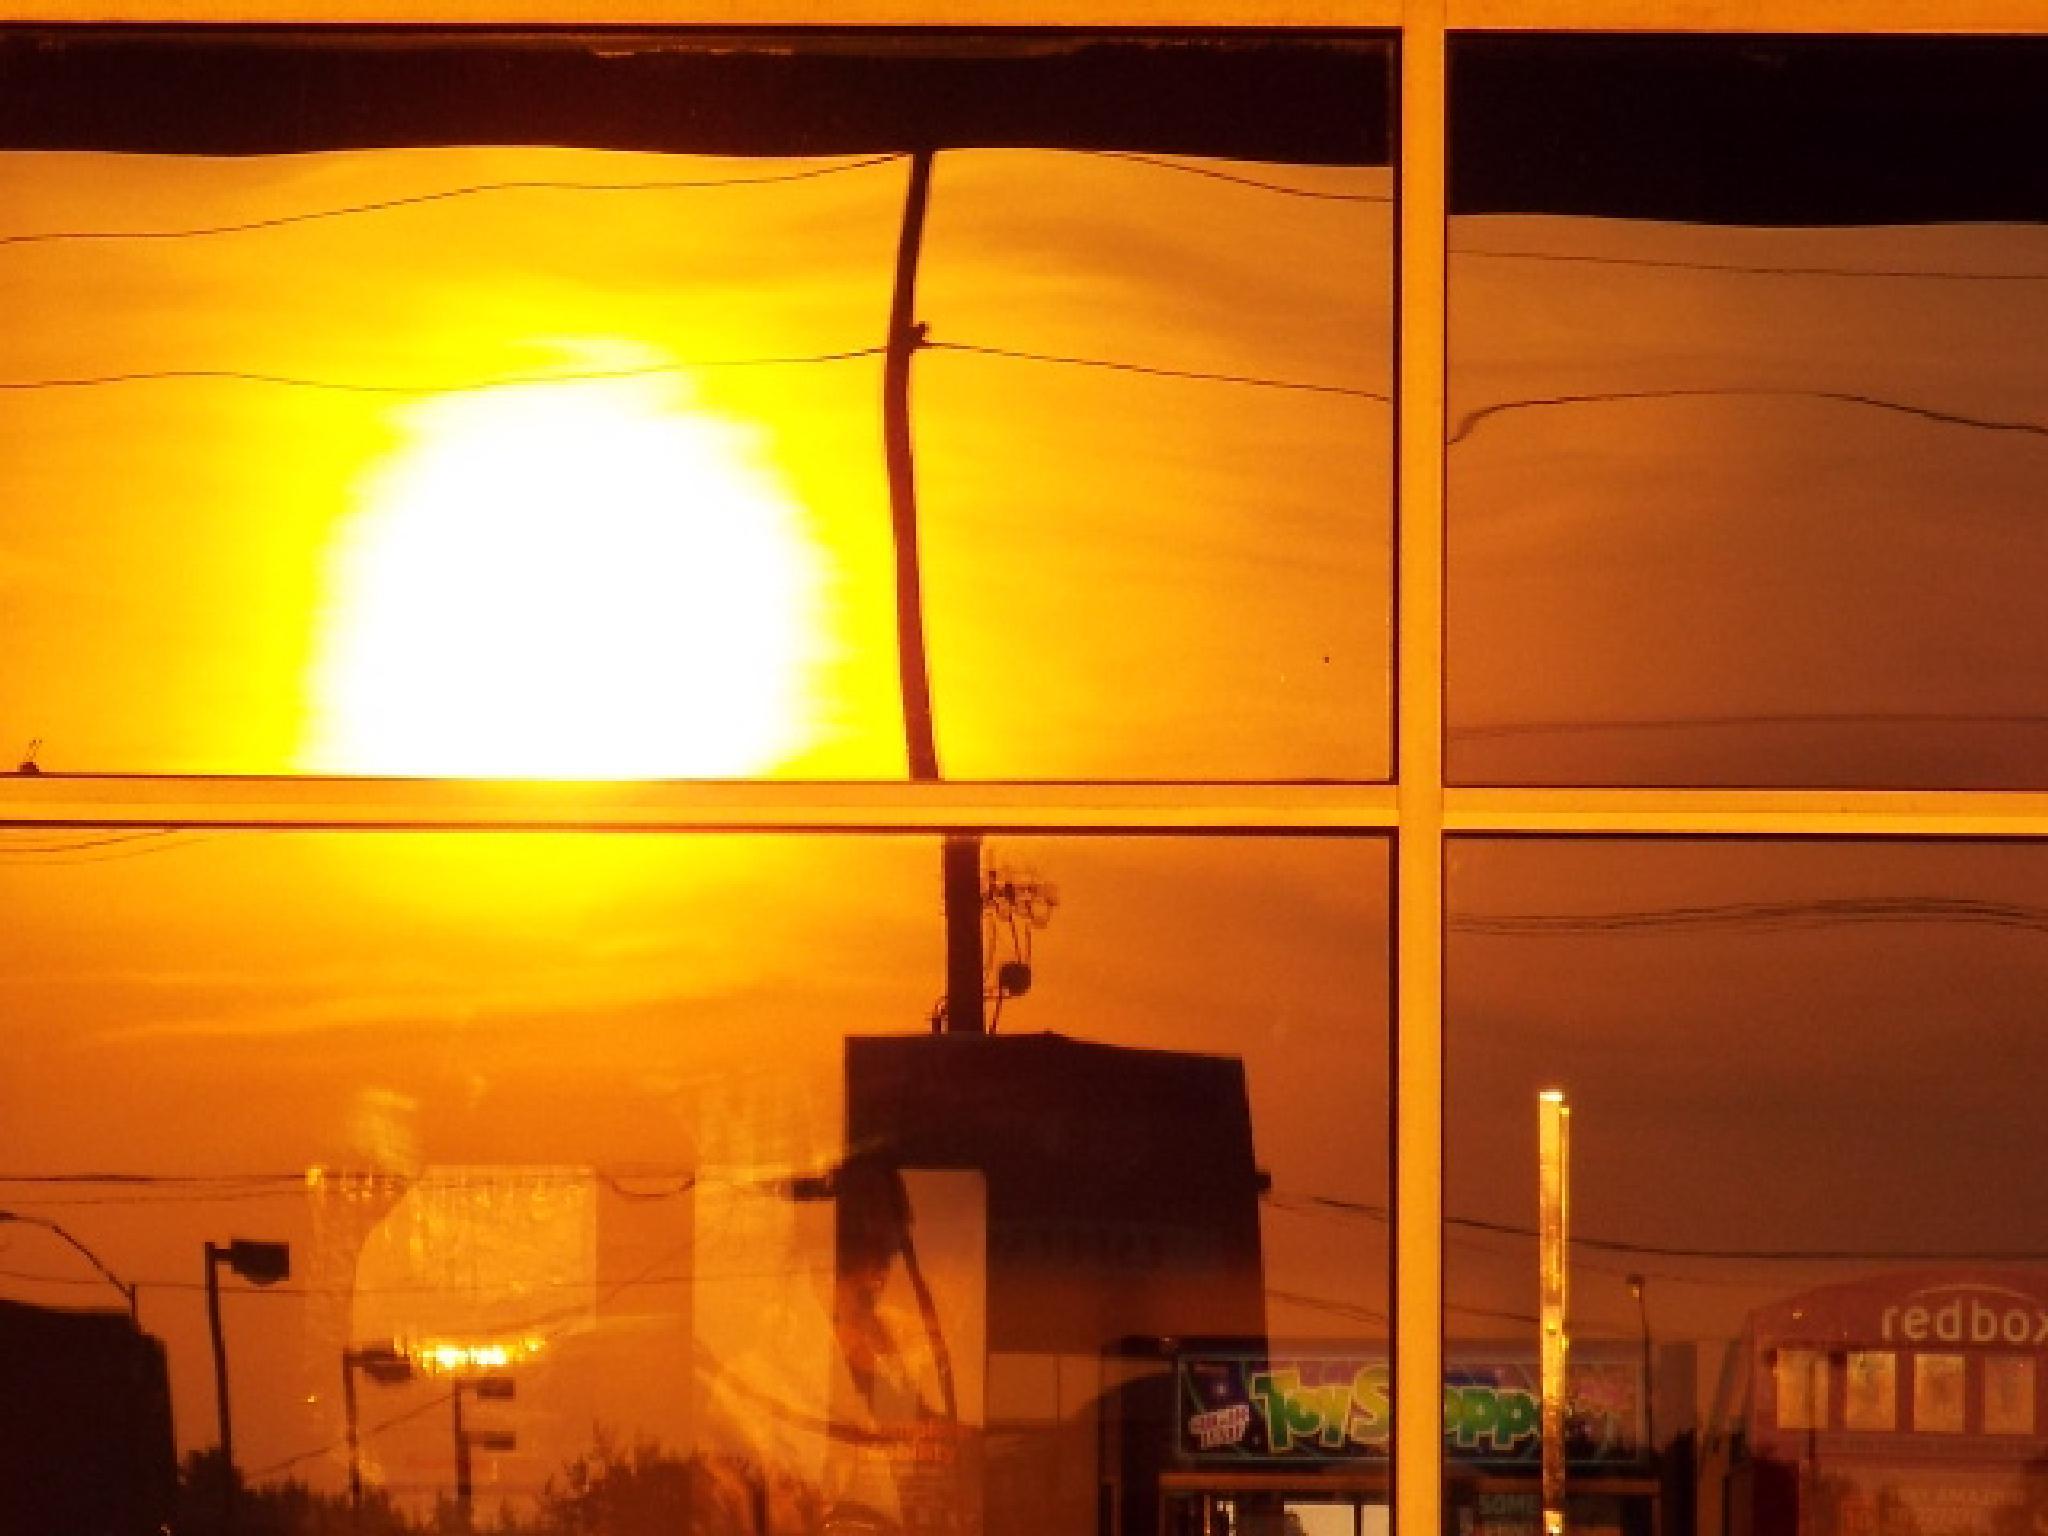 """Sunburst Reflection"" by Ron Berkley"